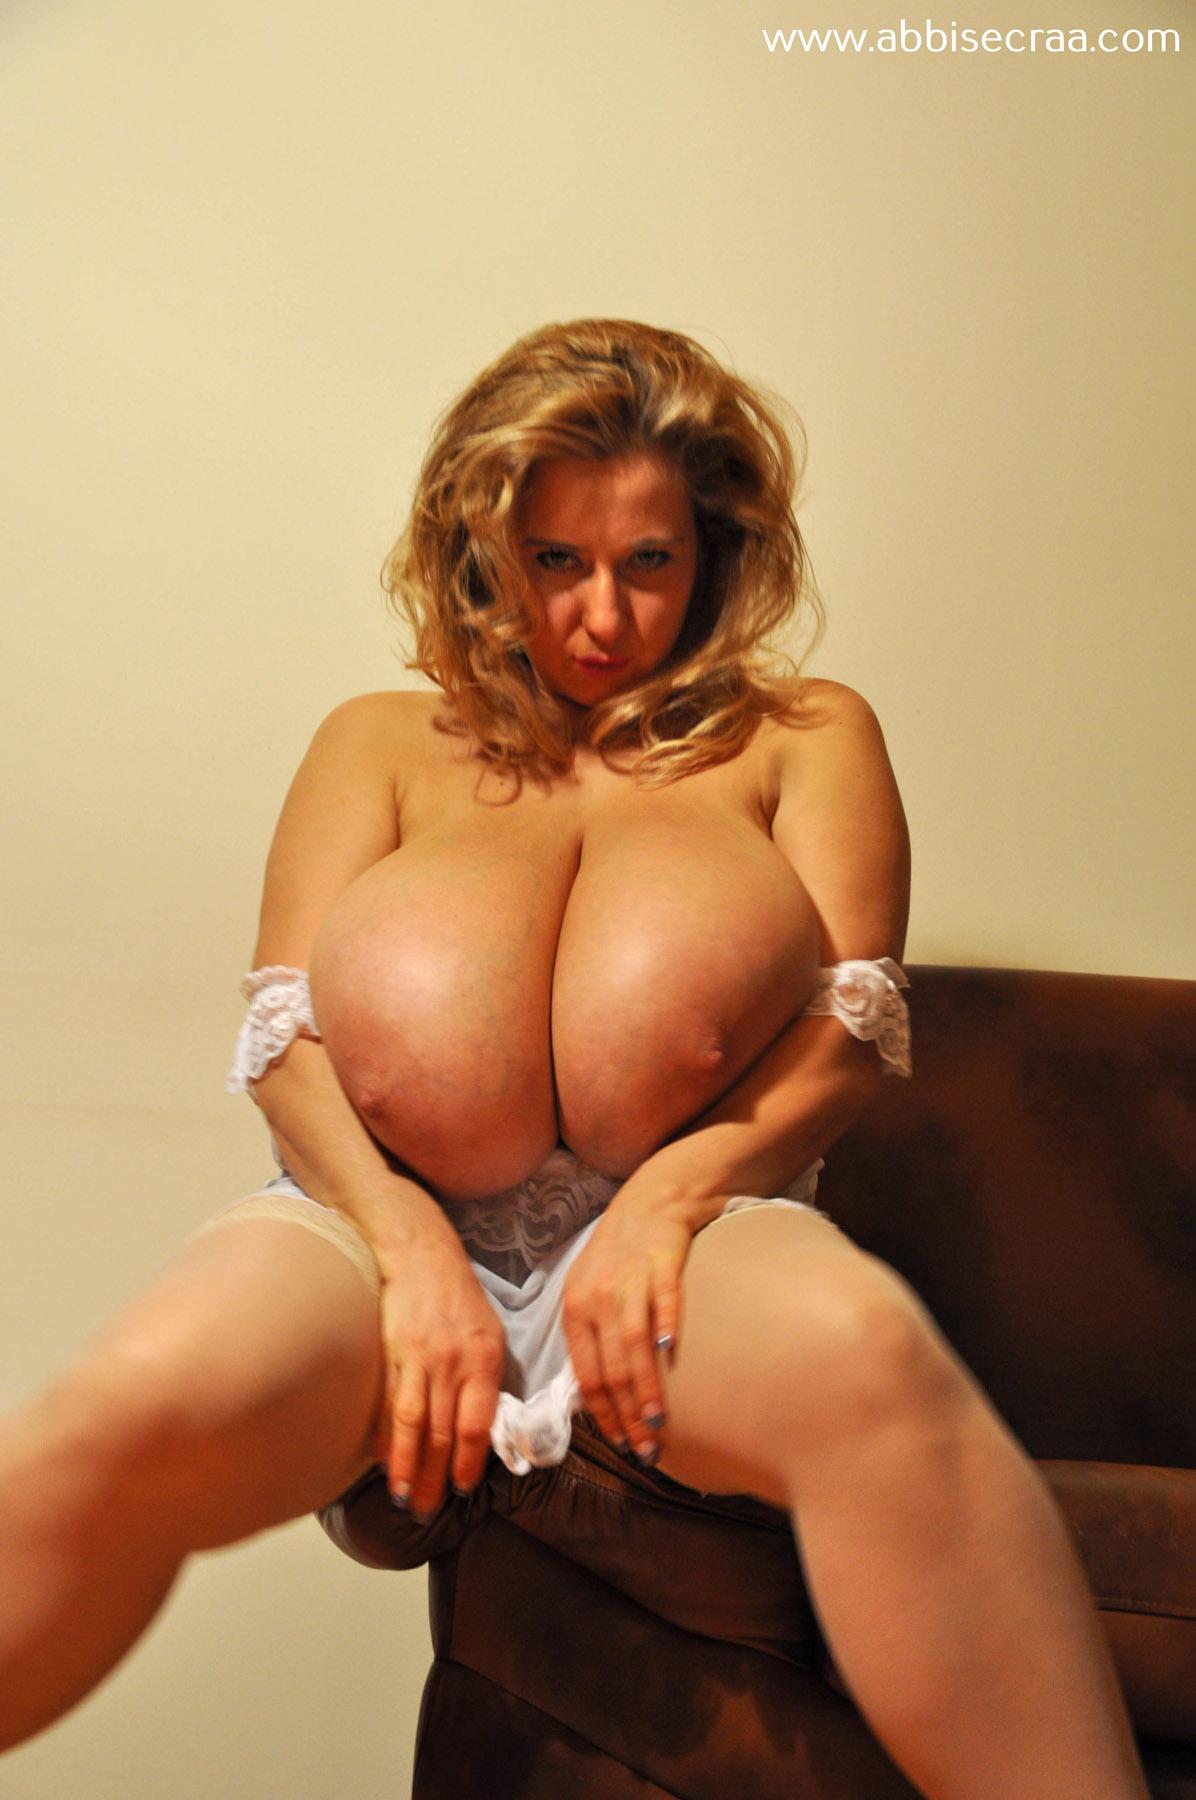 Abbi secraa nude